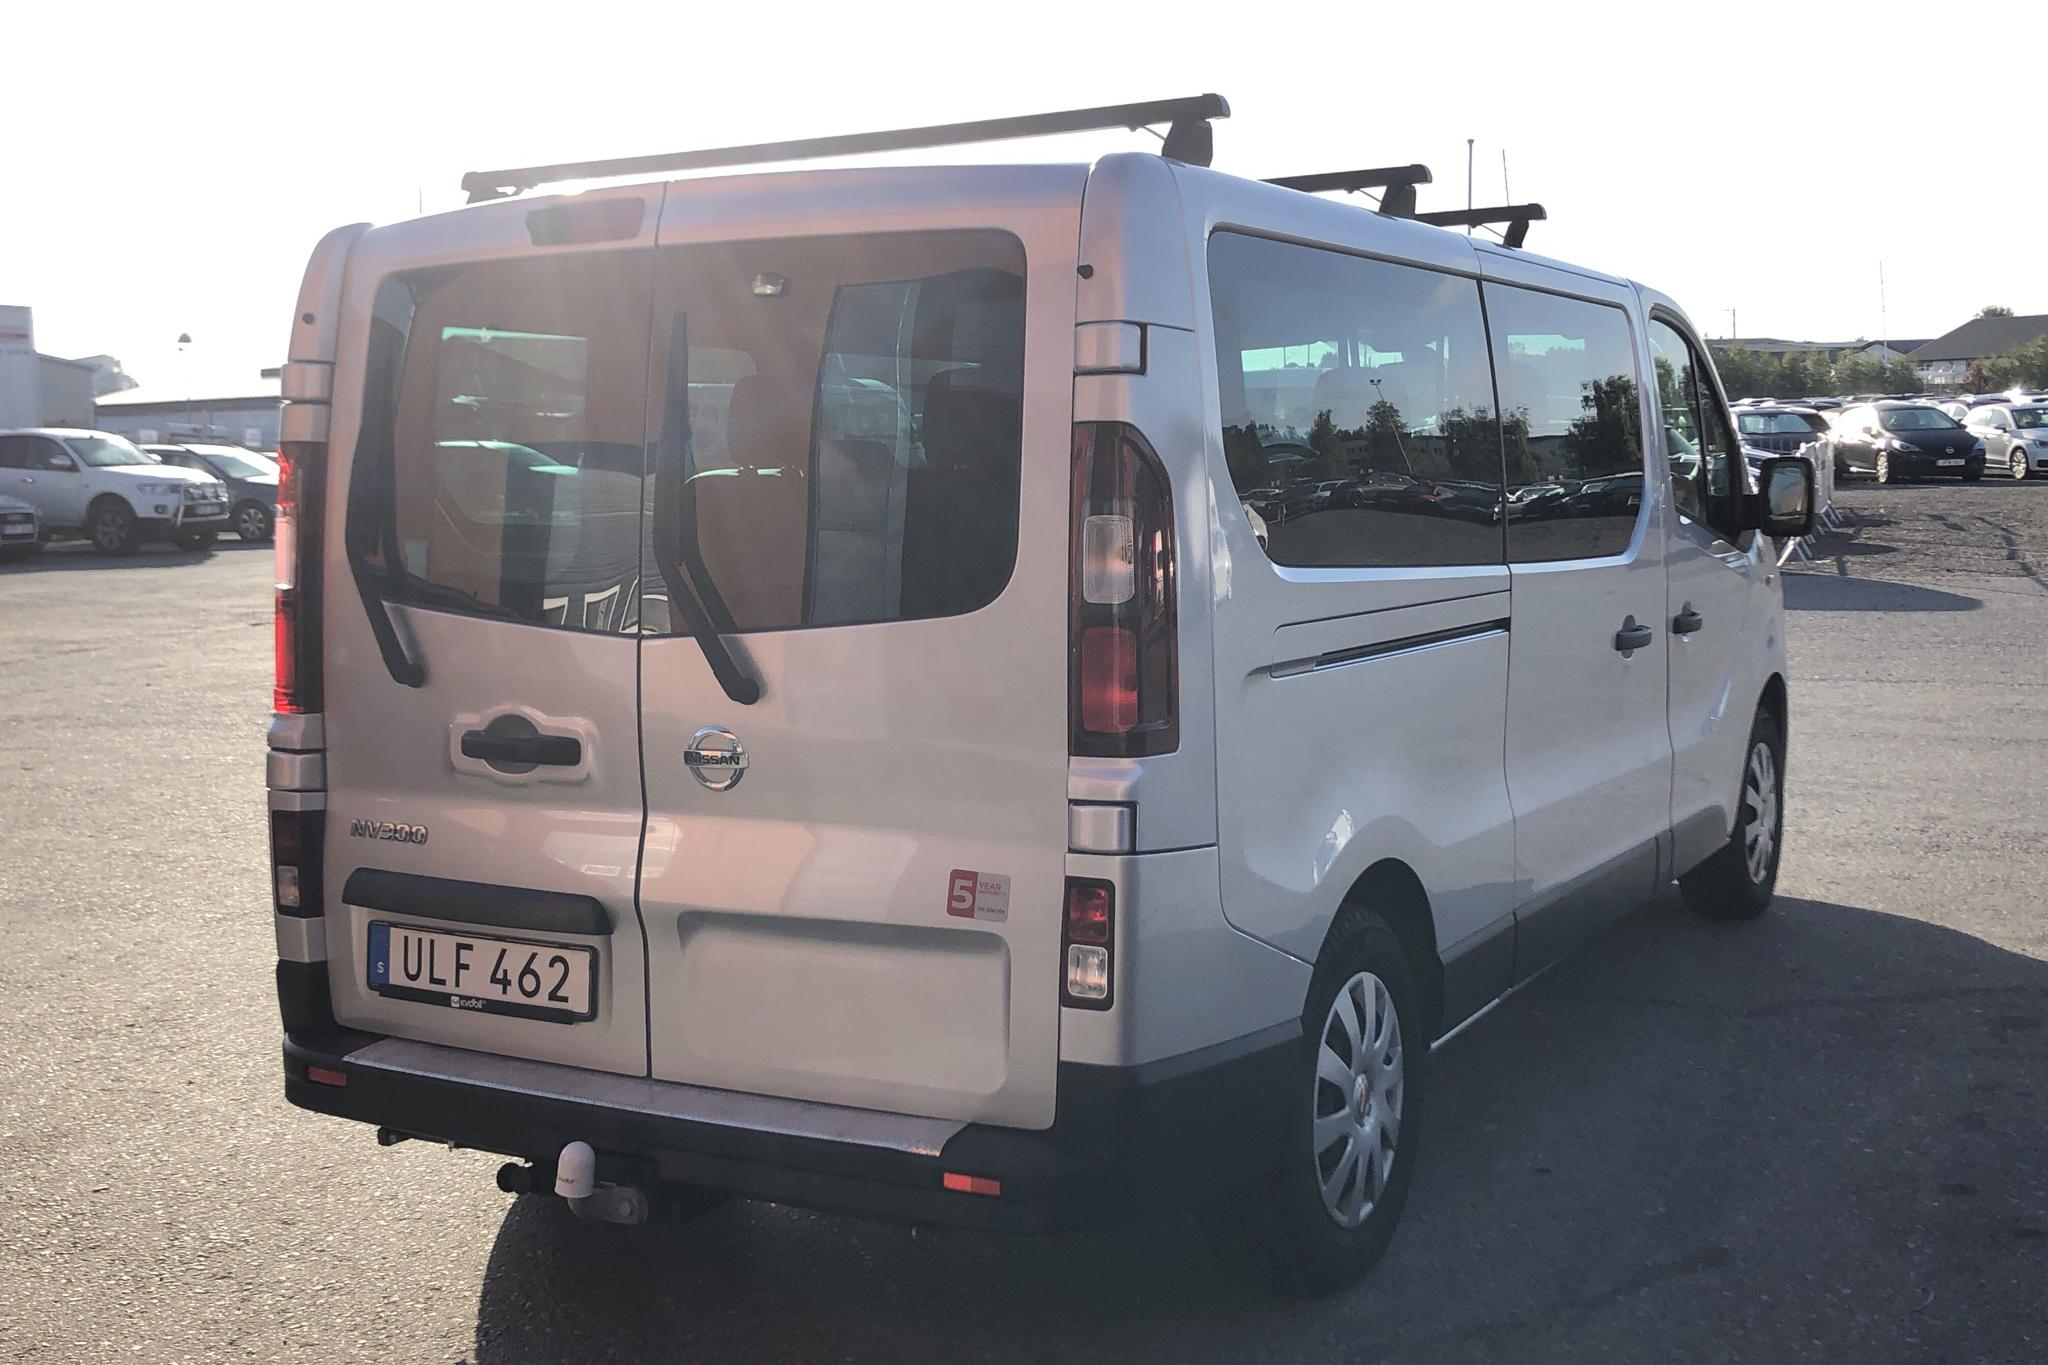 Nissan NV300 1.6 dCi (145hk) - 46 400 km - Manual - silver - 2018